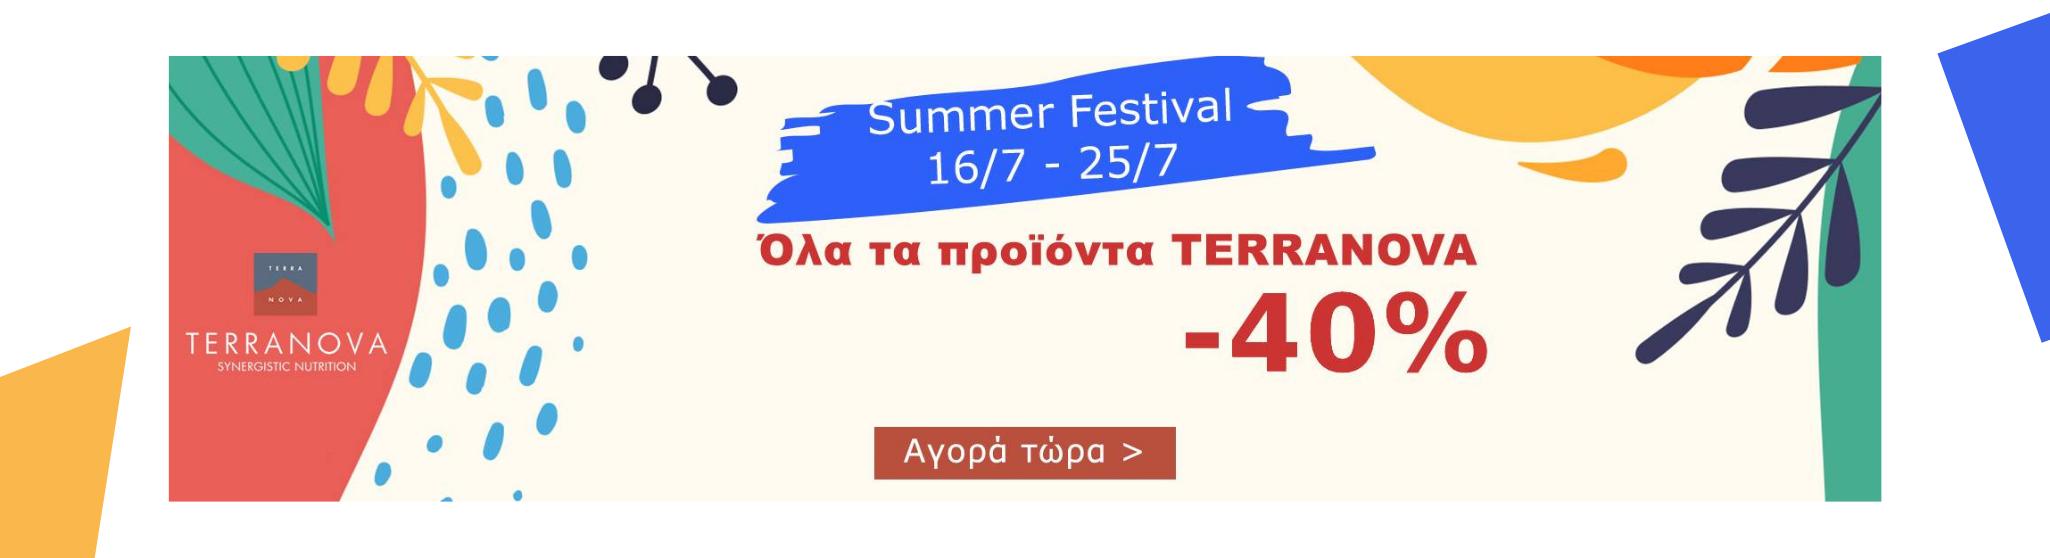 Terranova summer festival